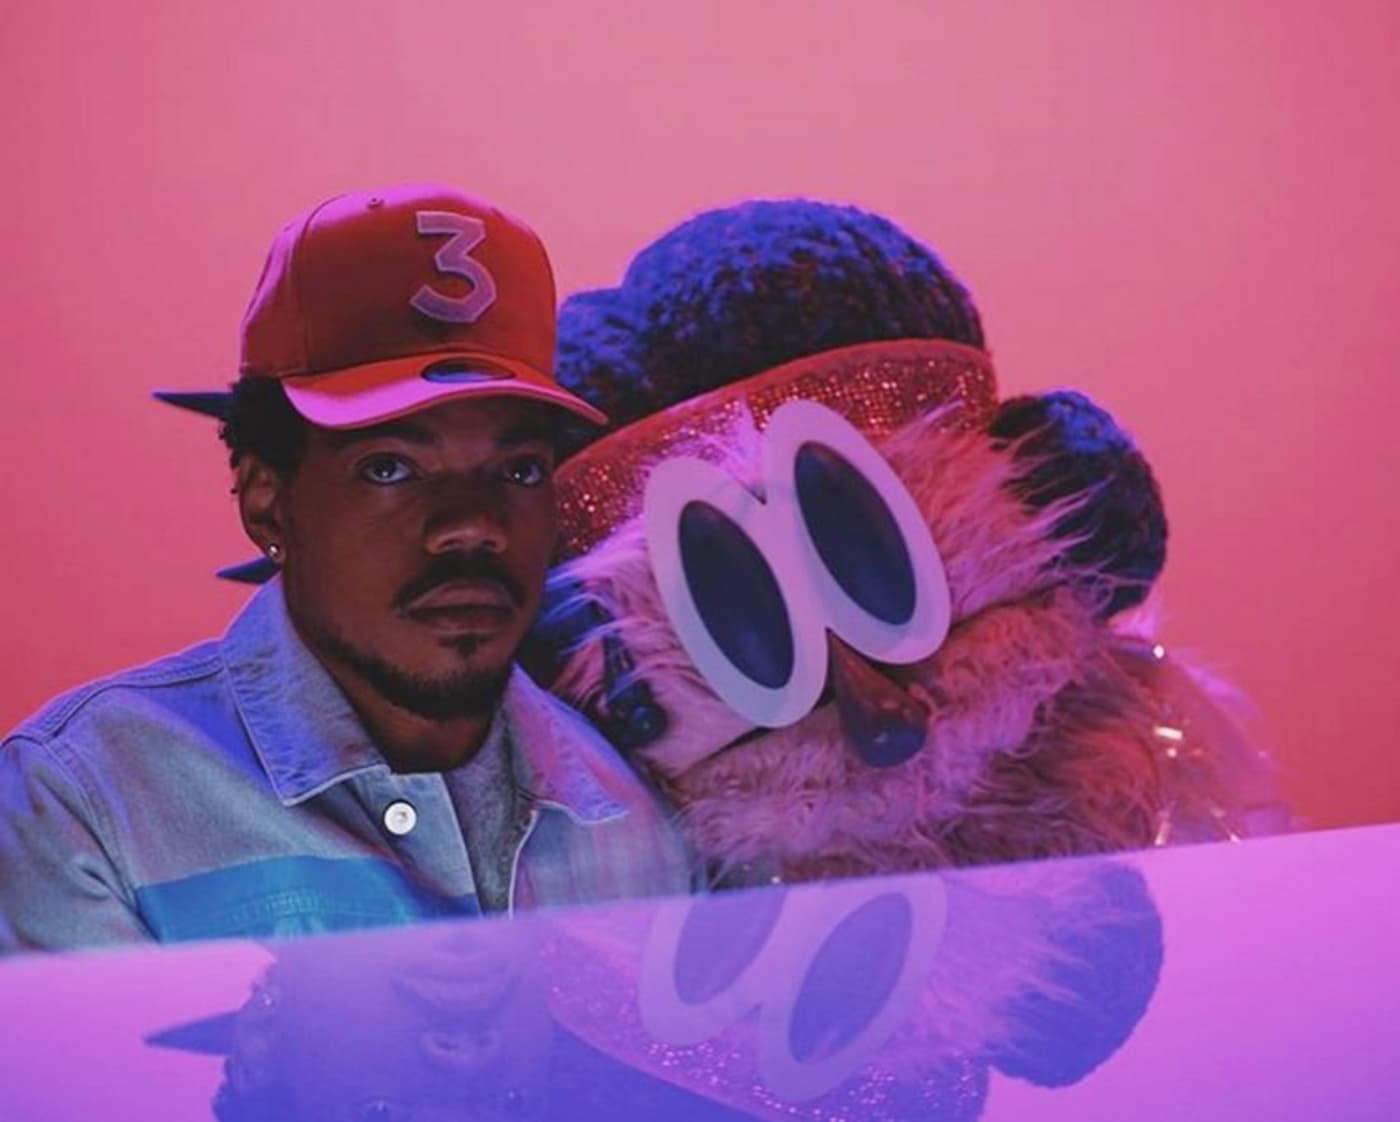 chance the rapper puppet